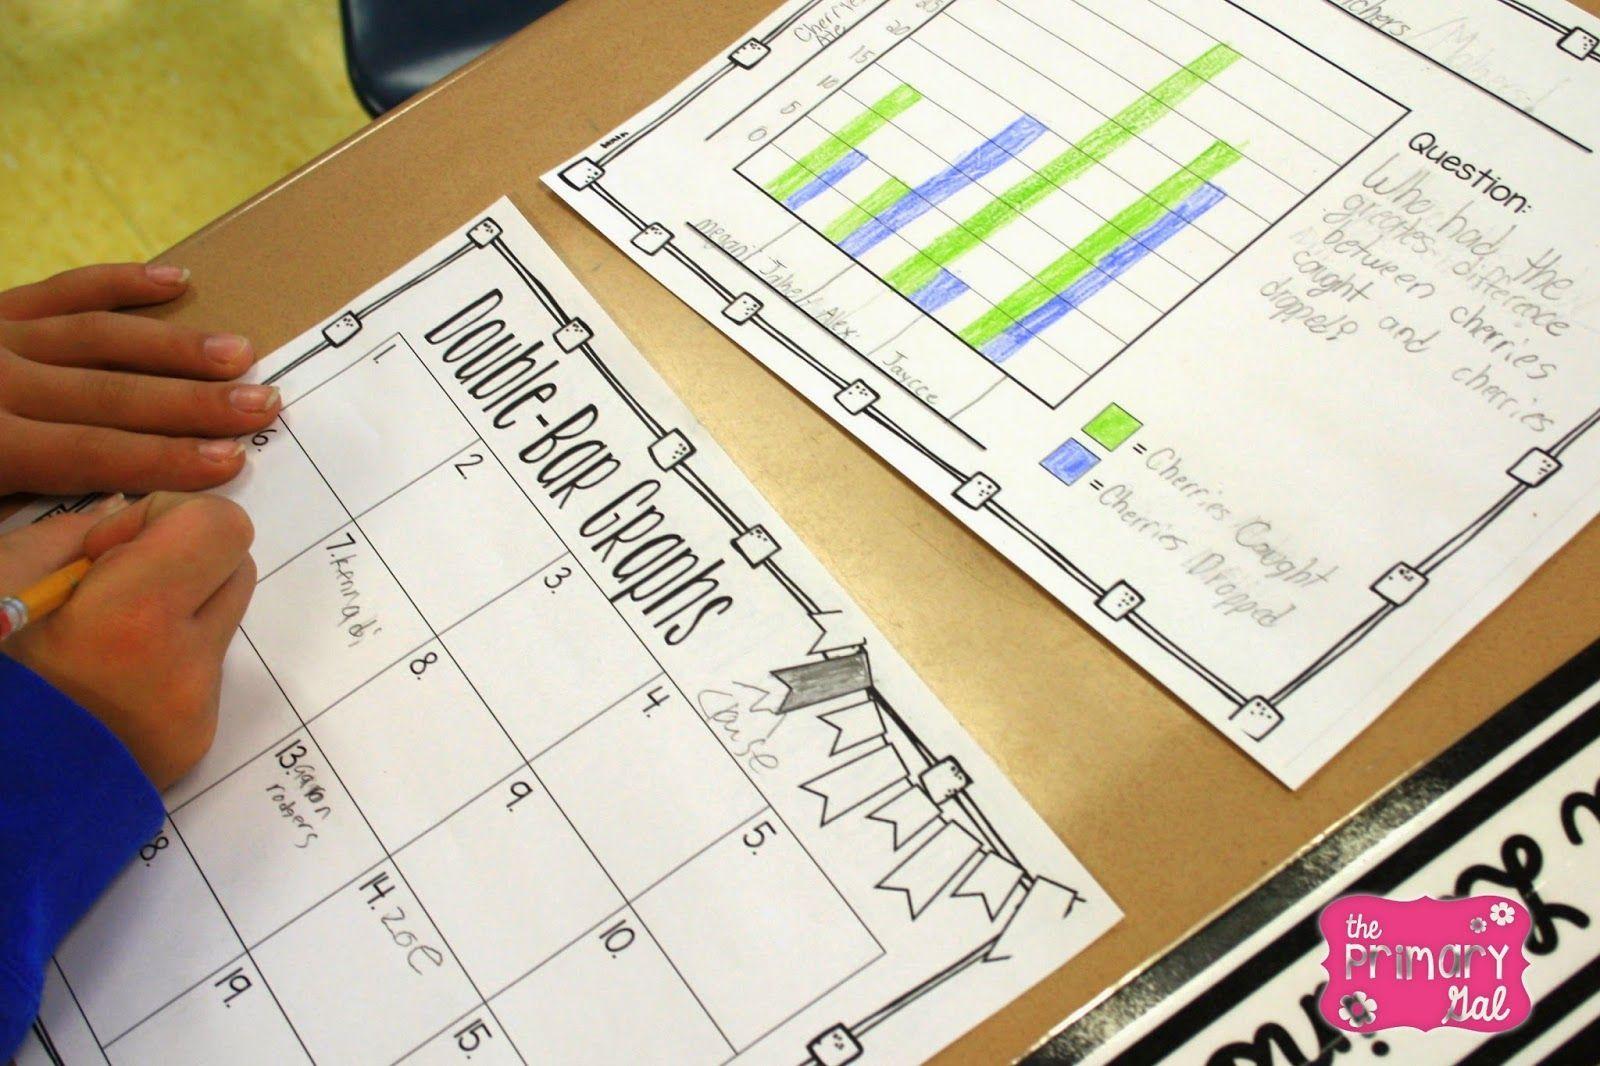 medium resolution of The Primary Gal: Create-a-Graph Scavenger Hunt Freebie!   Teaching math